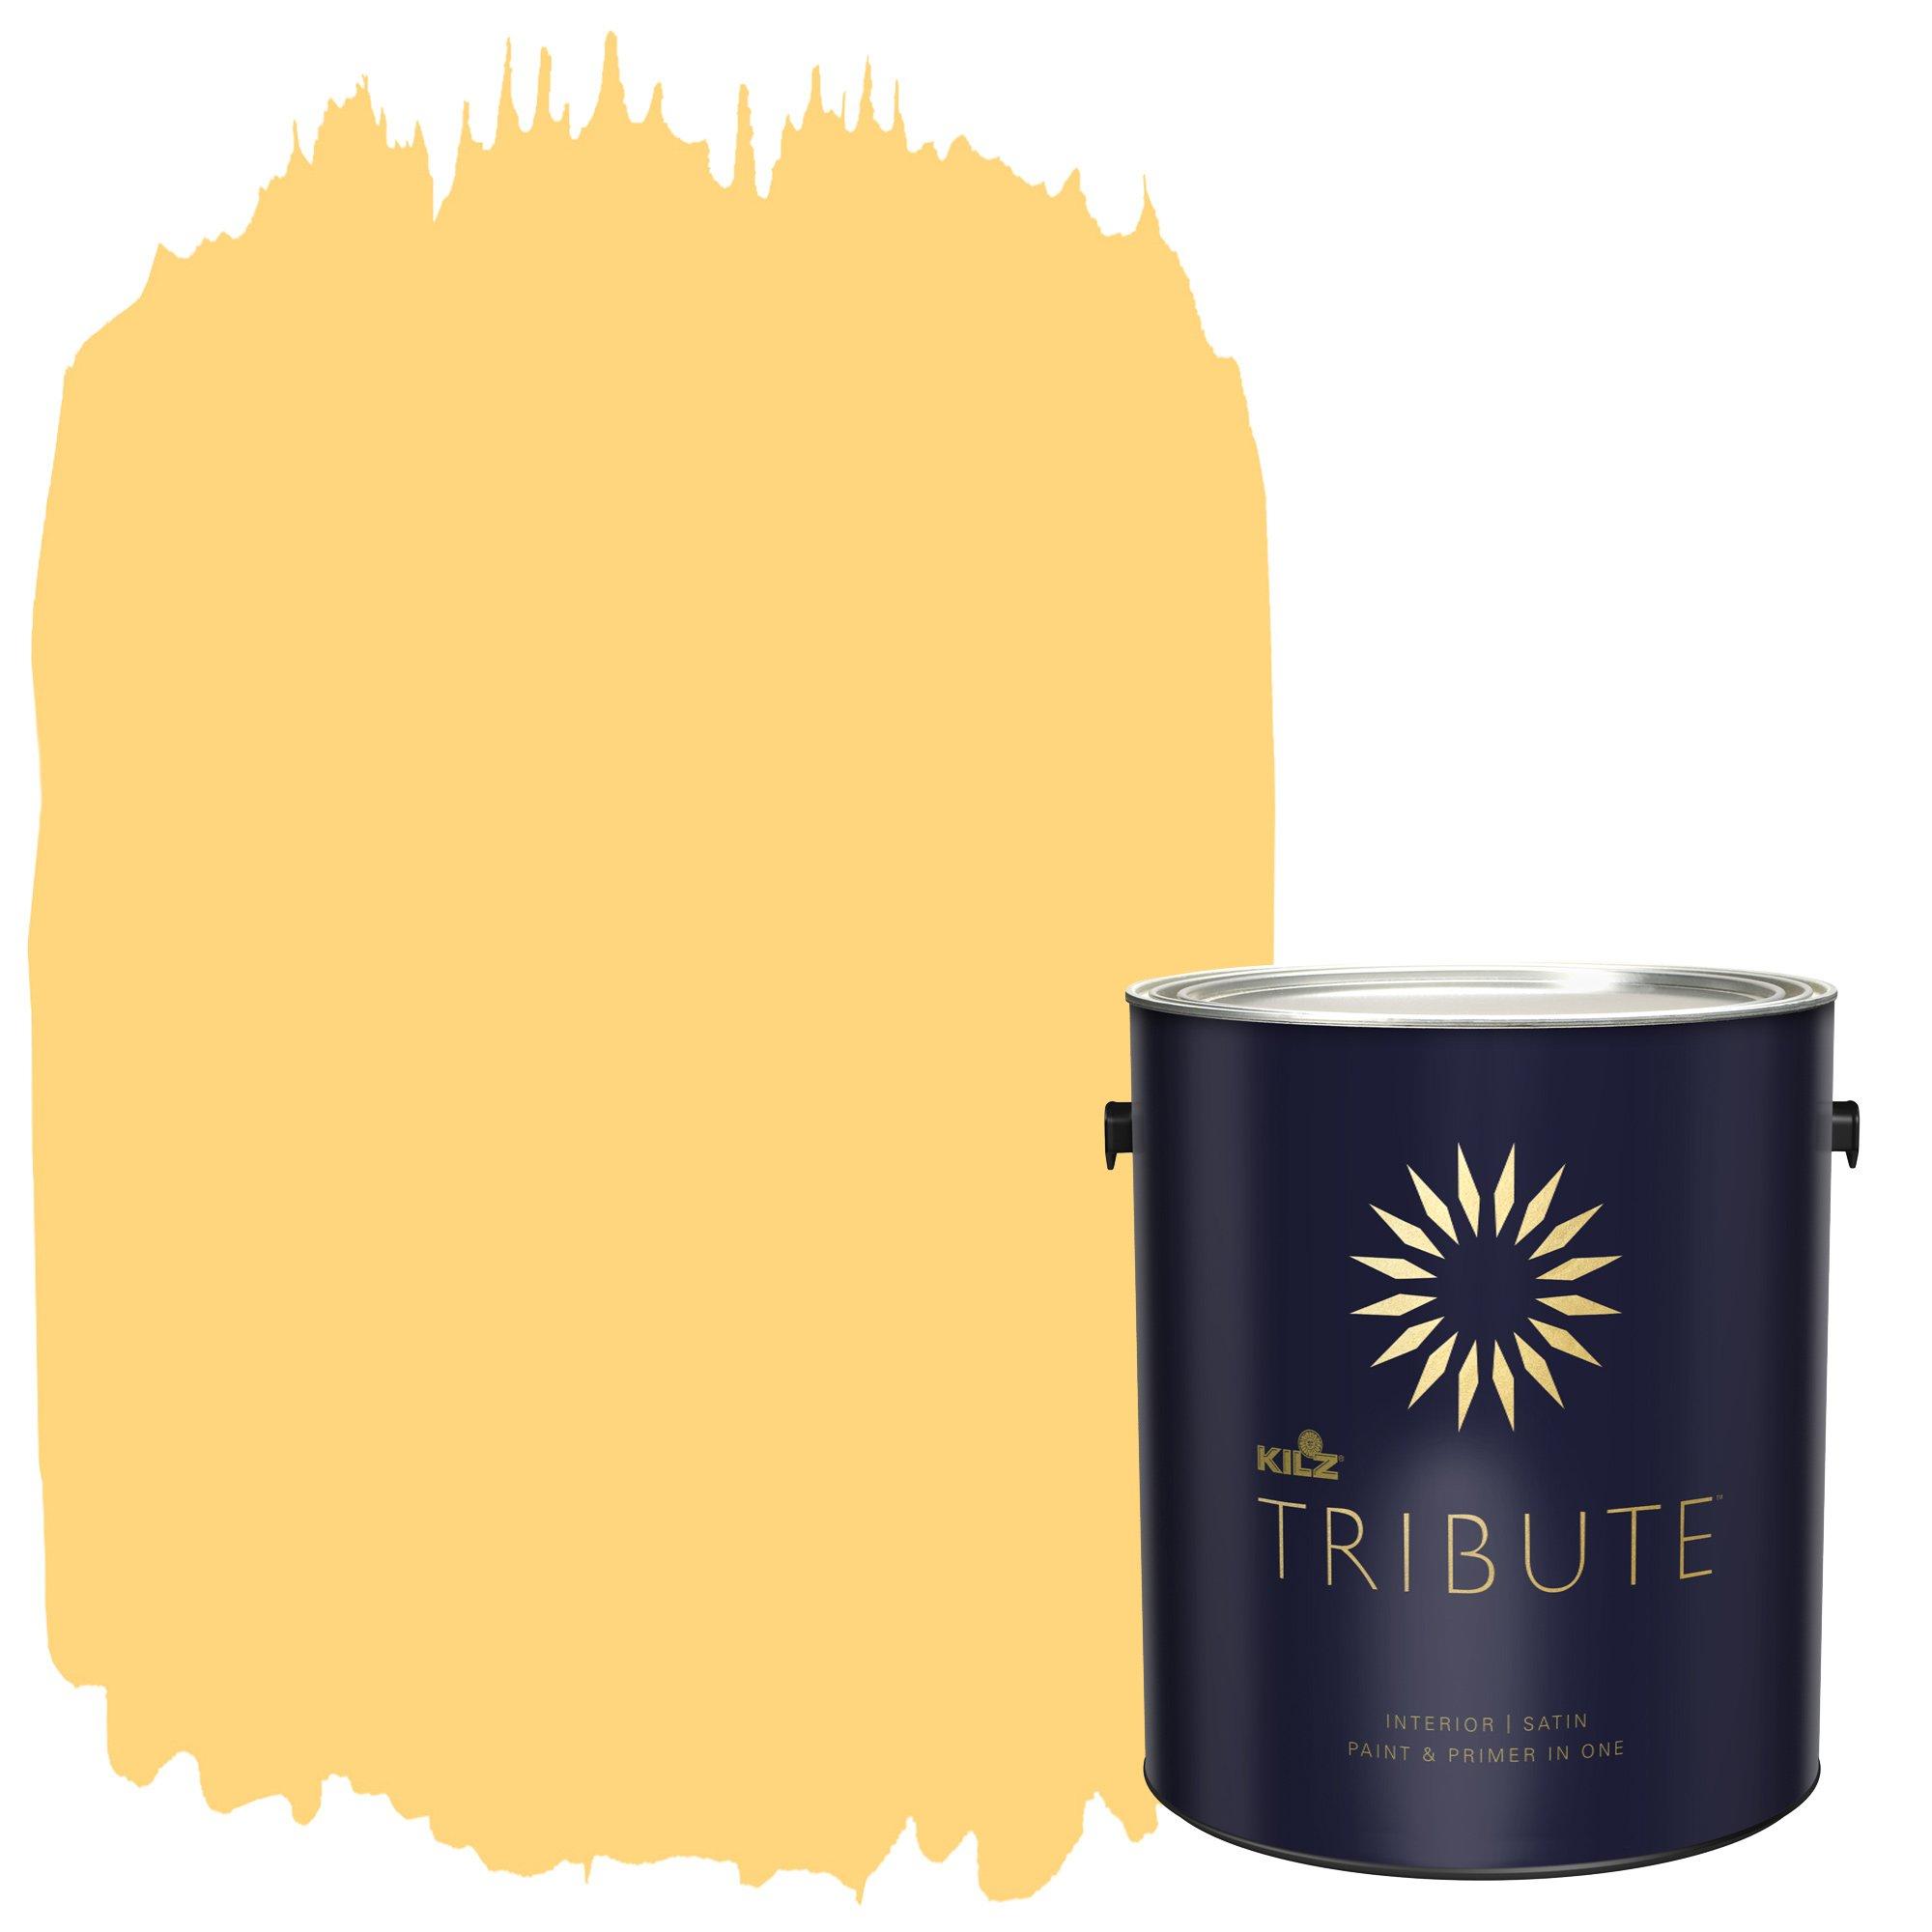 KILZ TRIBUTE Interior Satin Paint and Primer in One, 1 Gallon, Jazz Age Yellow (TB-85)